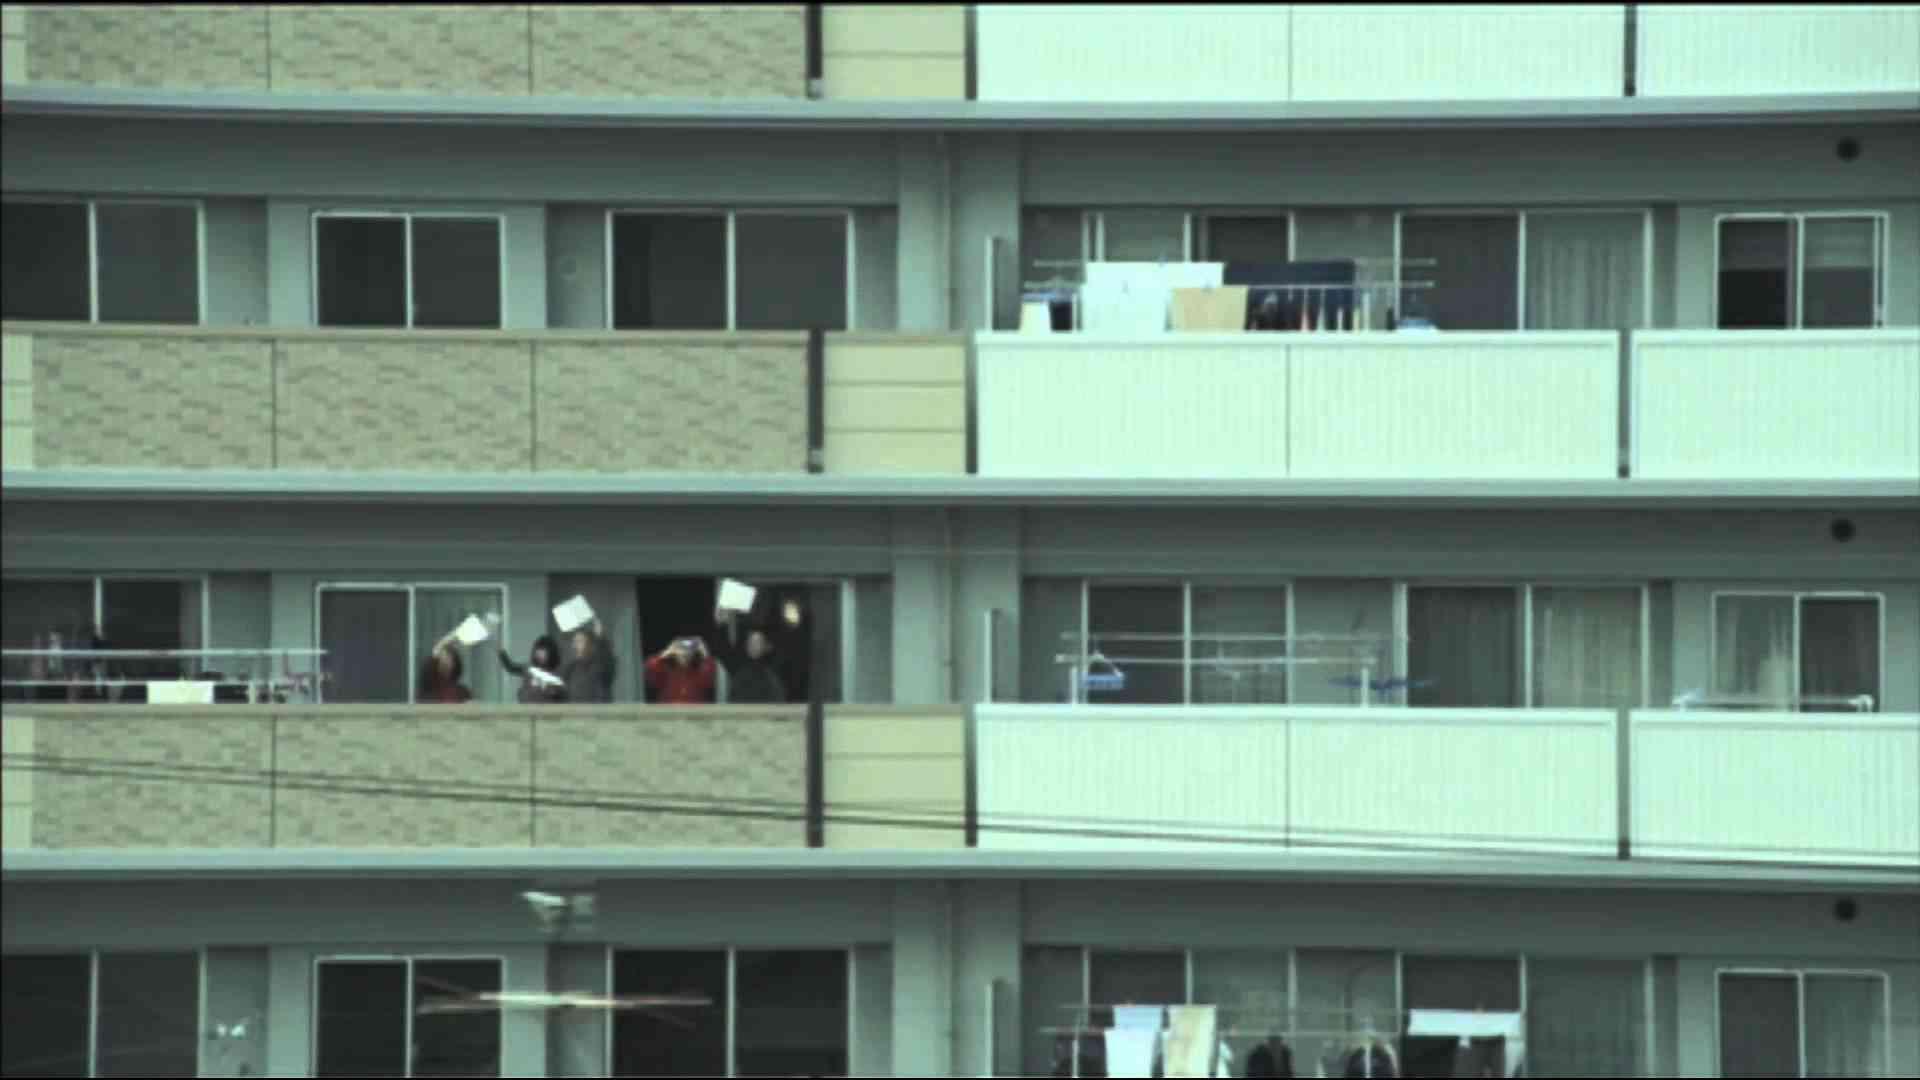 【HD】九州新幹線全線開業 祝!九州縦断ウェーブ CM「25分特別編」 - YouTube